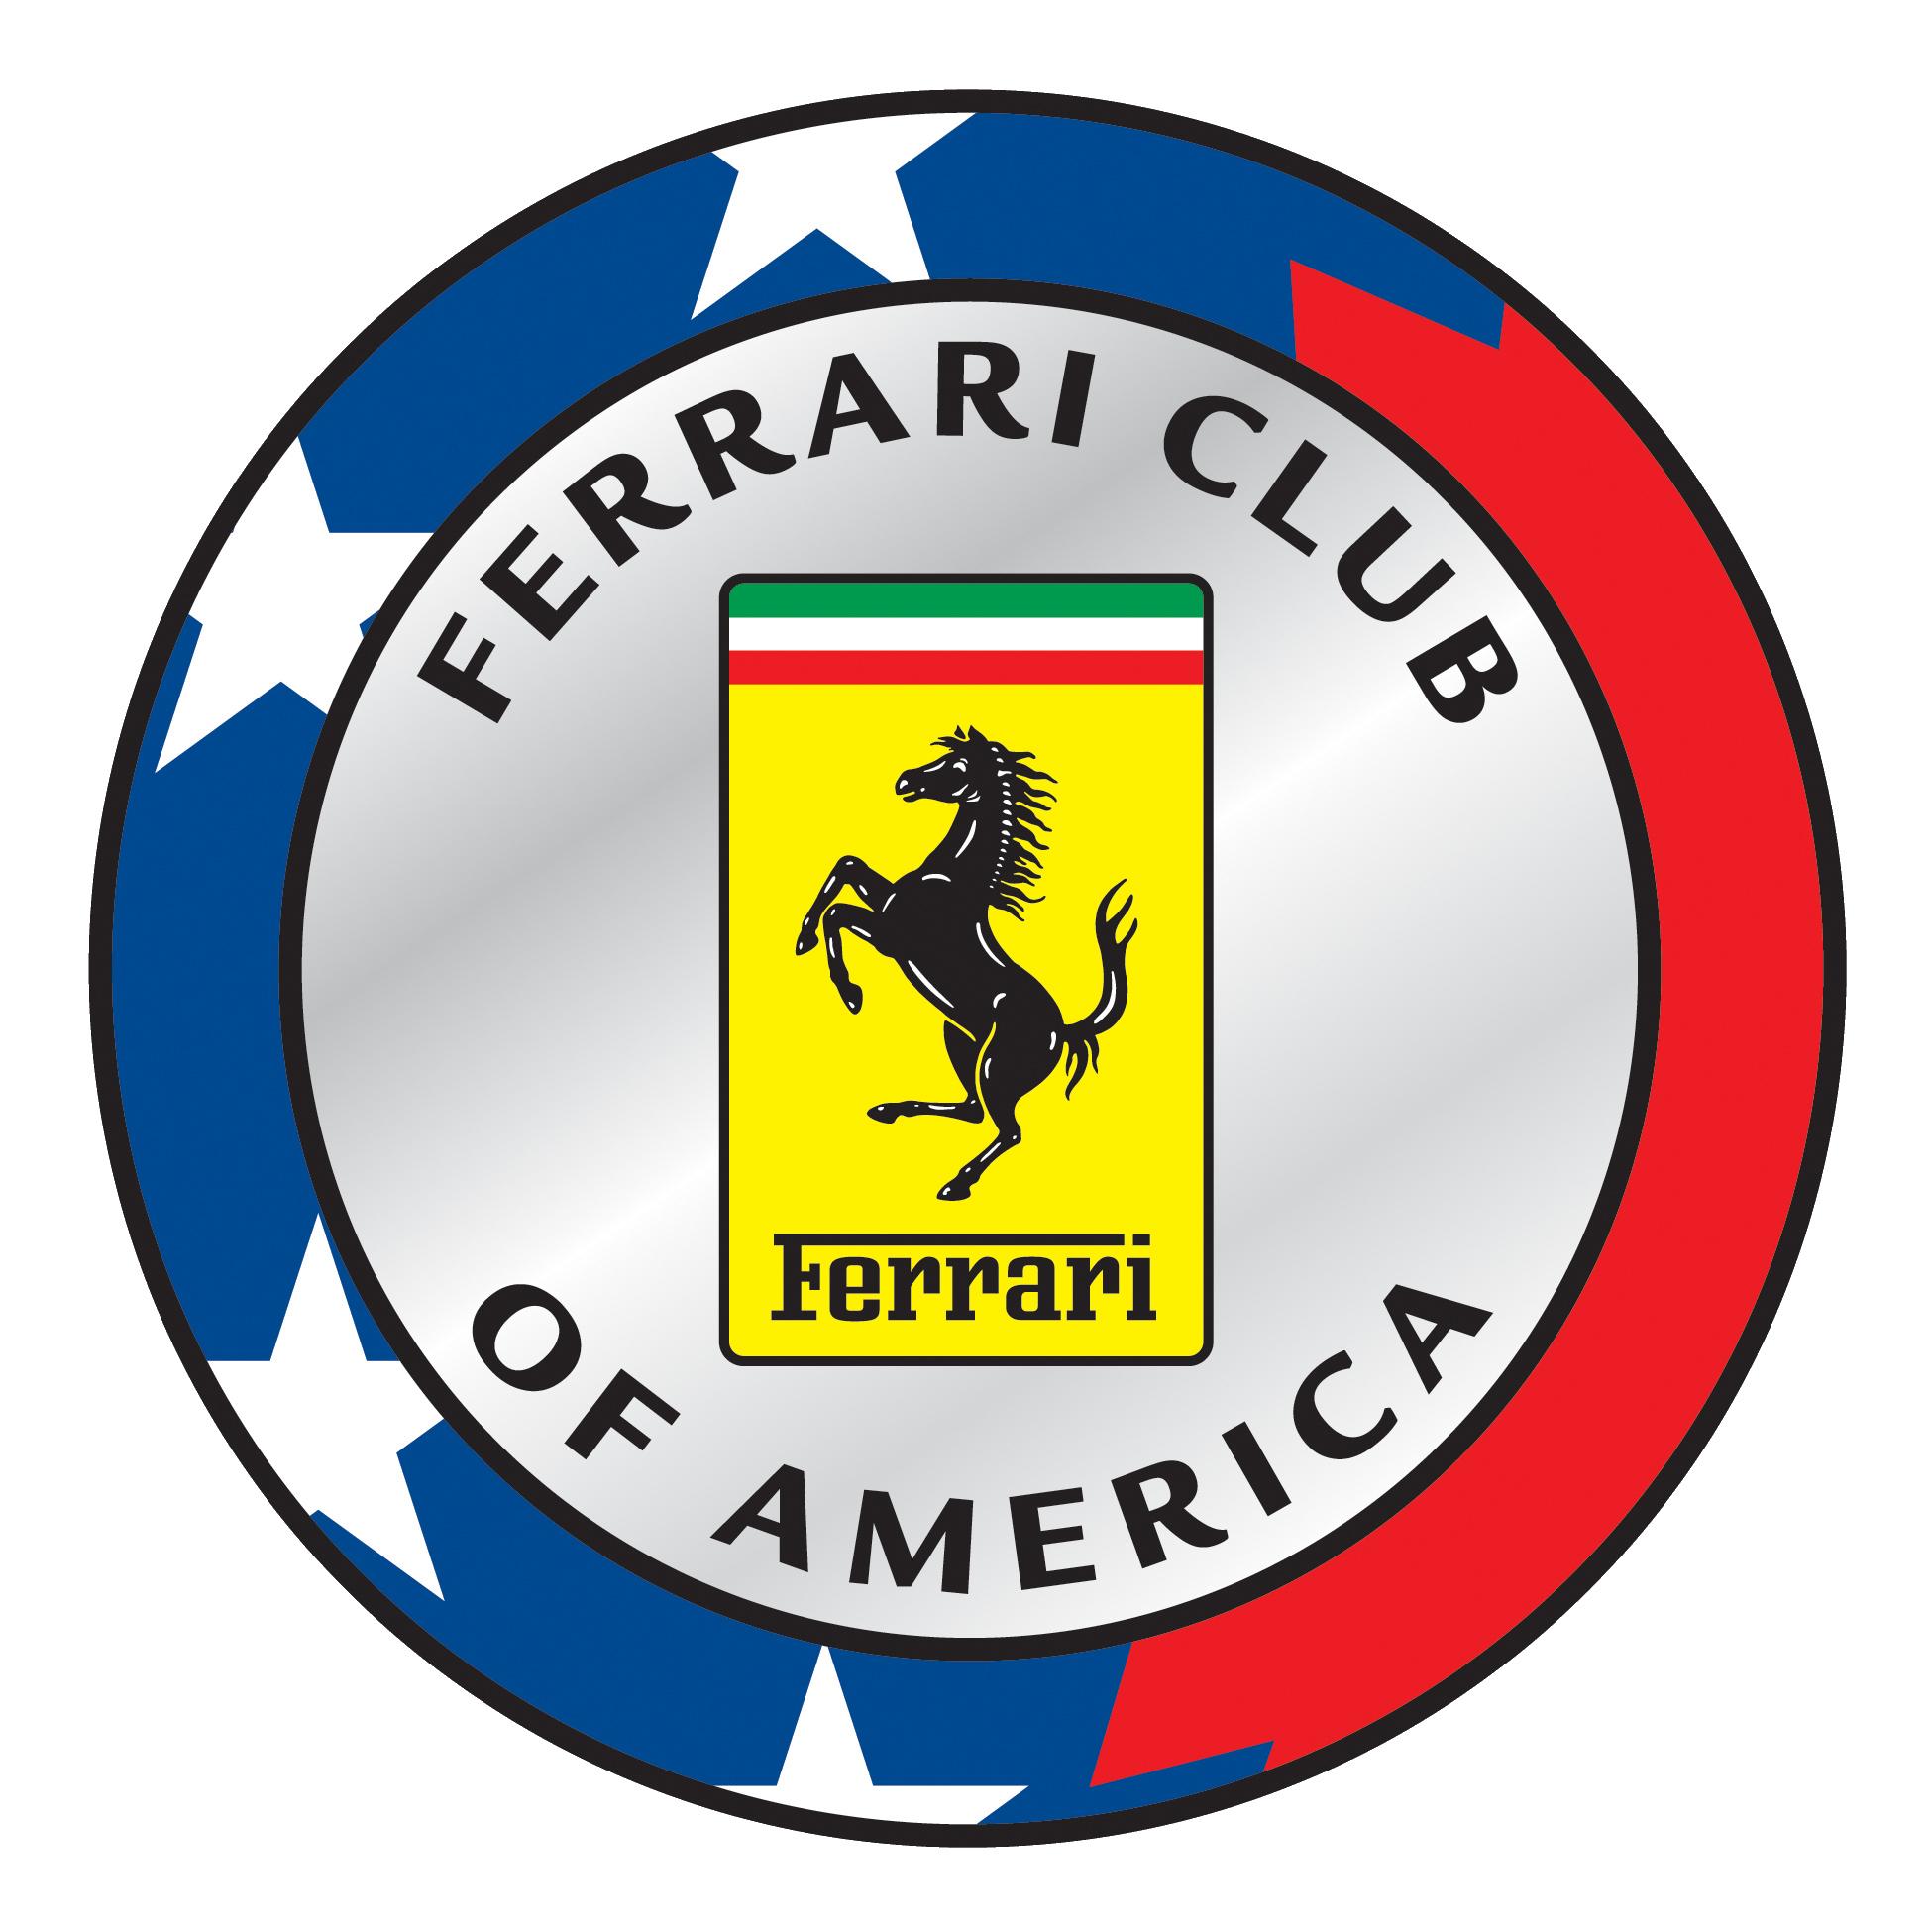 Ferrari Club Of America Classified Ads The Classified Marketplace